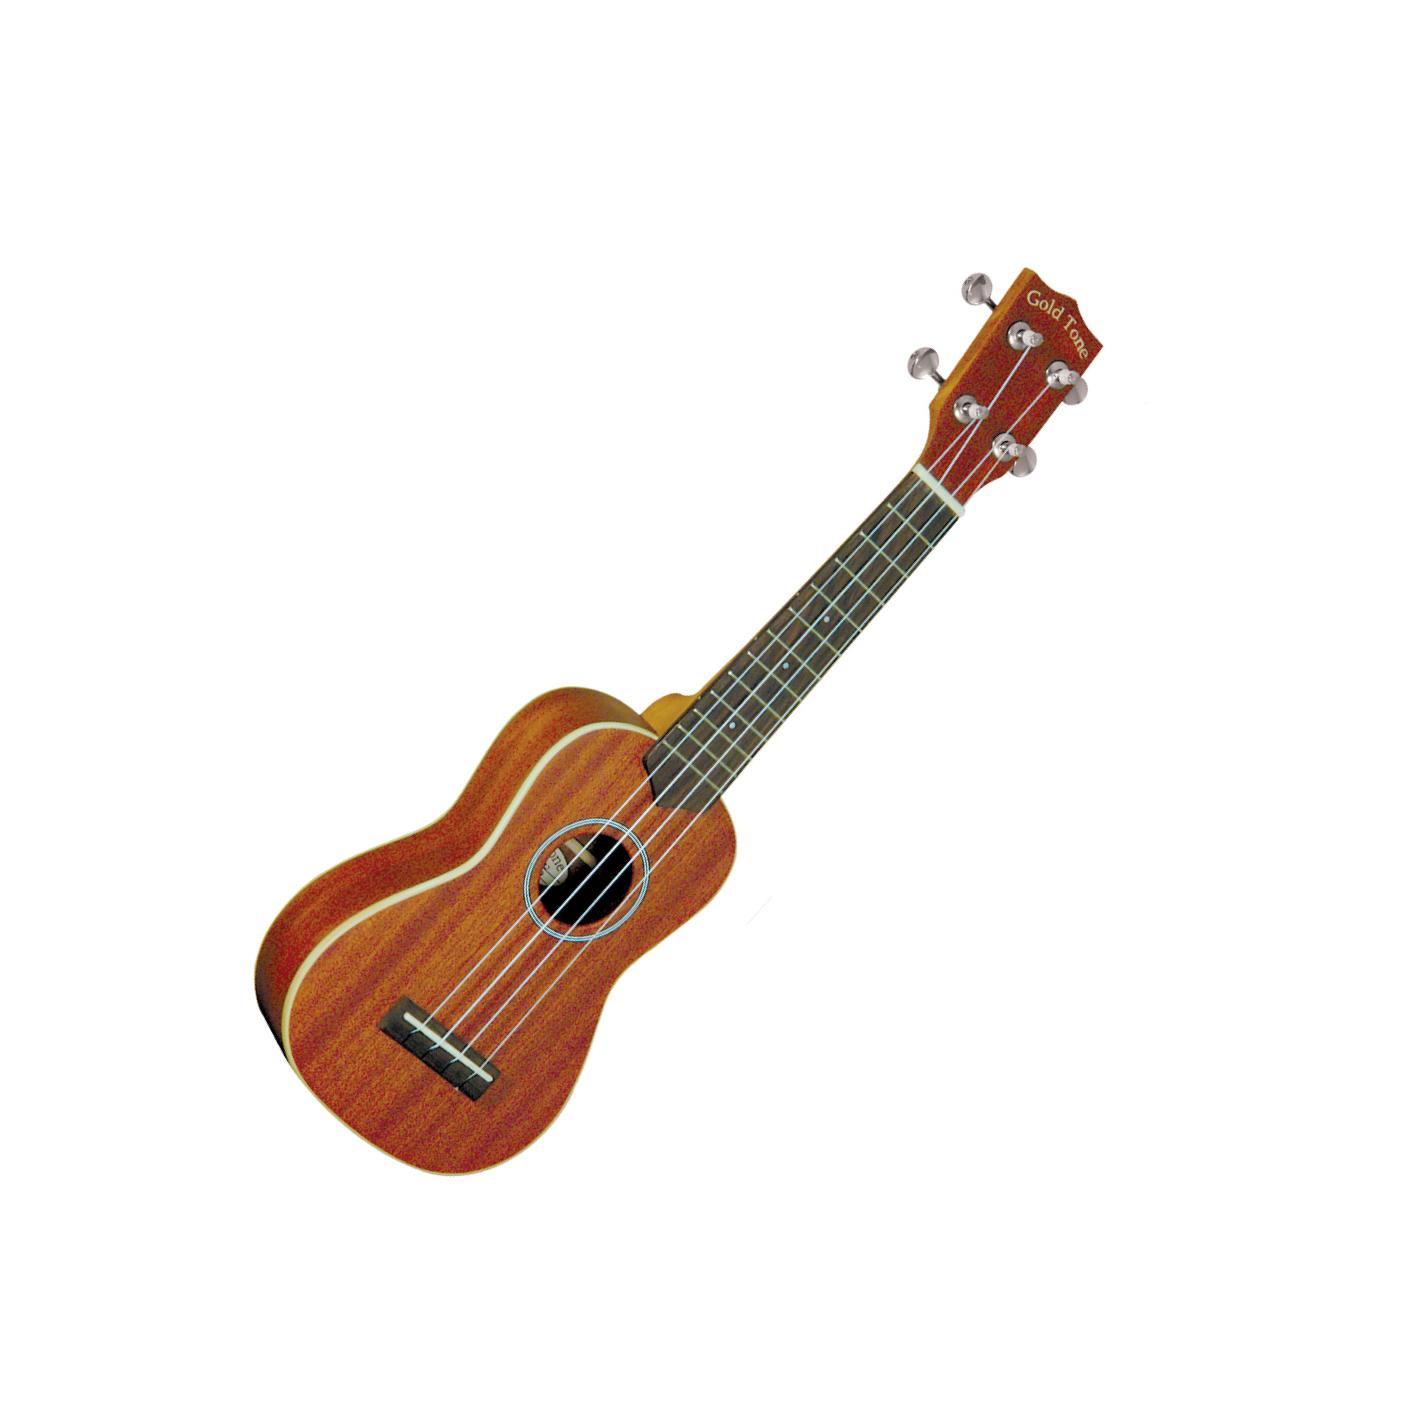 Gold Tone GU-100 Soprano Uke